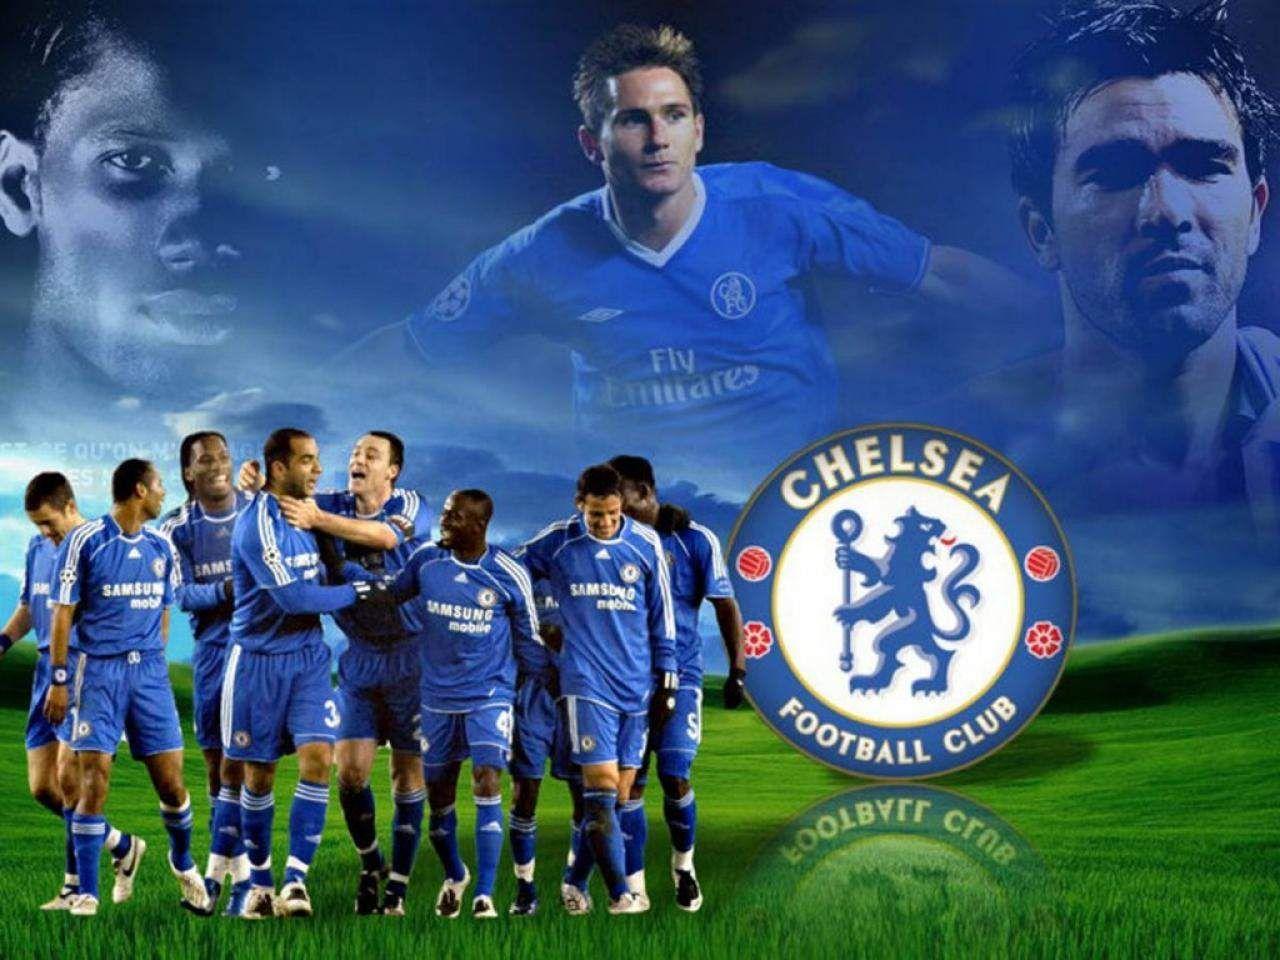 Chelsea FC Desktop Wallpaper   1280×768 Wallpaper Chelsea (54 Wallpapers)   Adorable Wallpapers